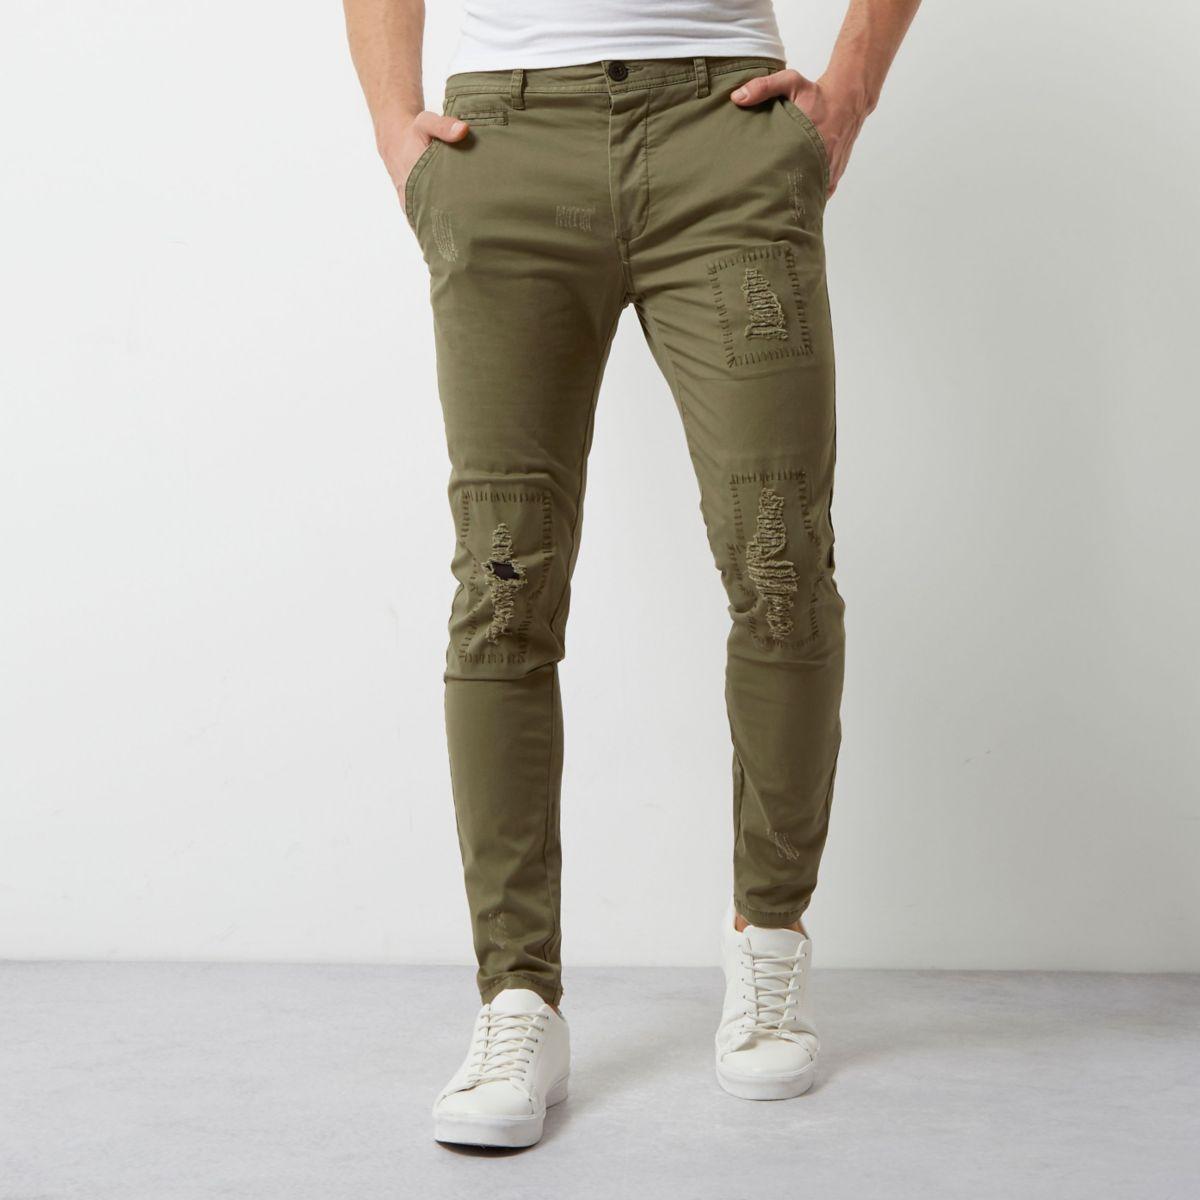 Khaki green distressed skinny pants